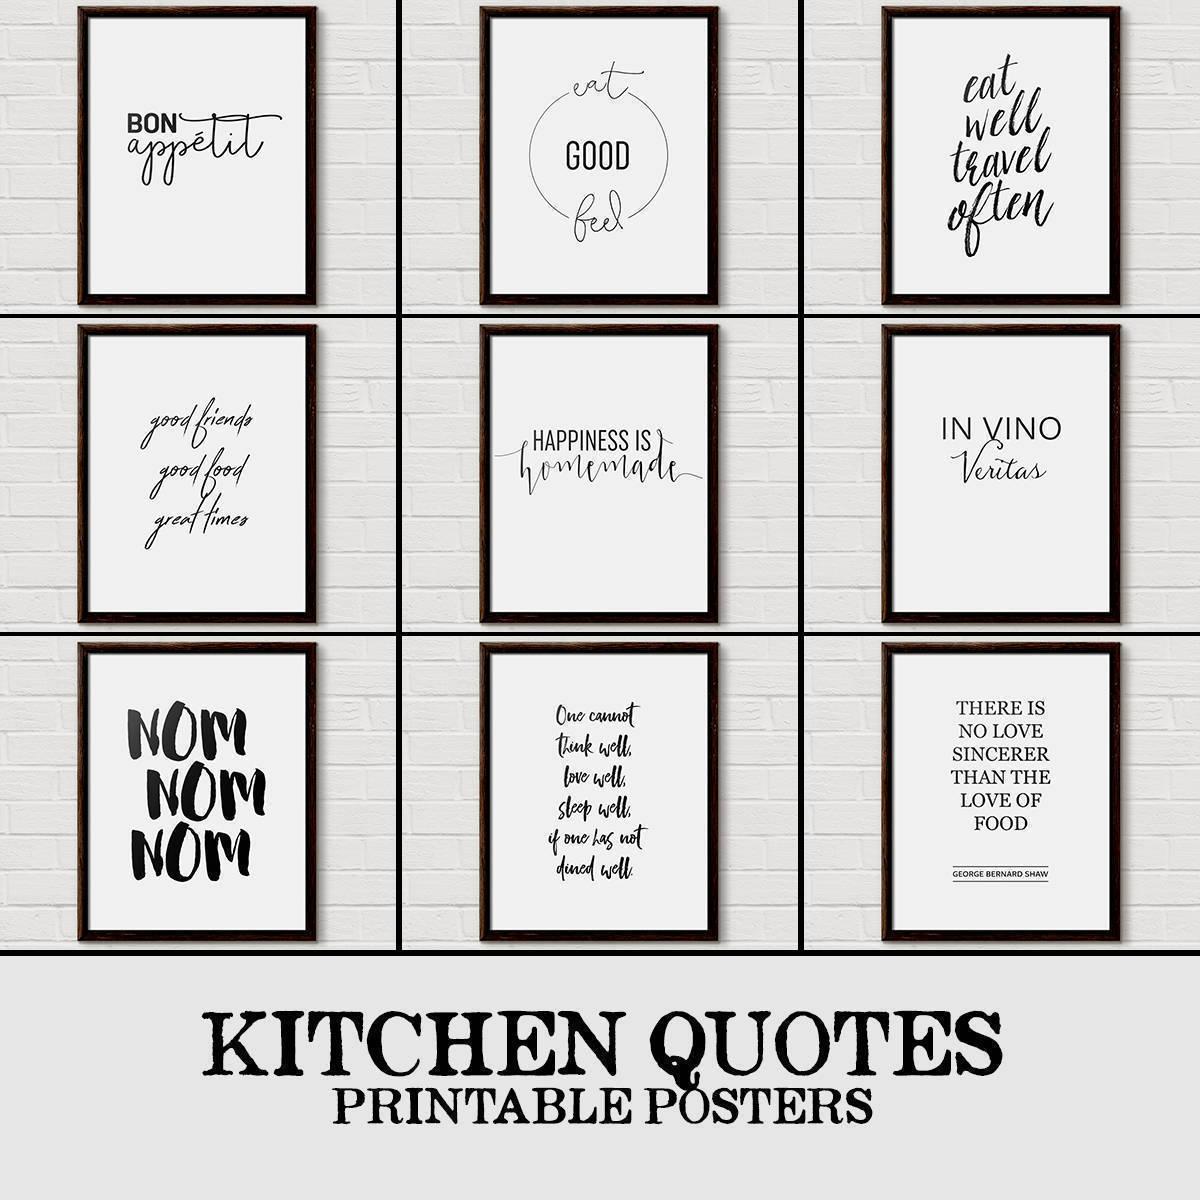 Asparagus Kitchen Print Art Prints Kitchen Prints Wall Art Prints Wall Prints Food Art Vegan Vegetarian Vegetable Veg Food Cook